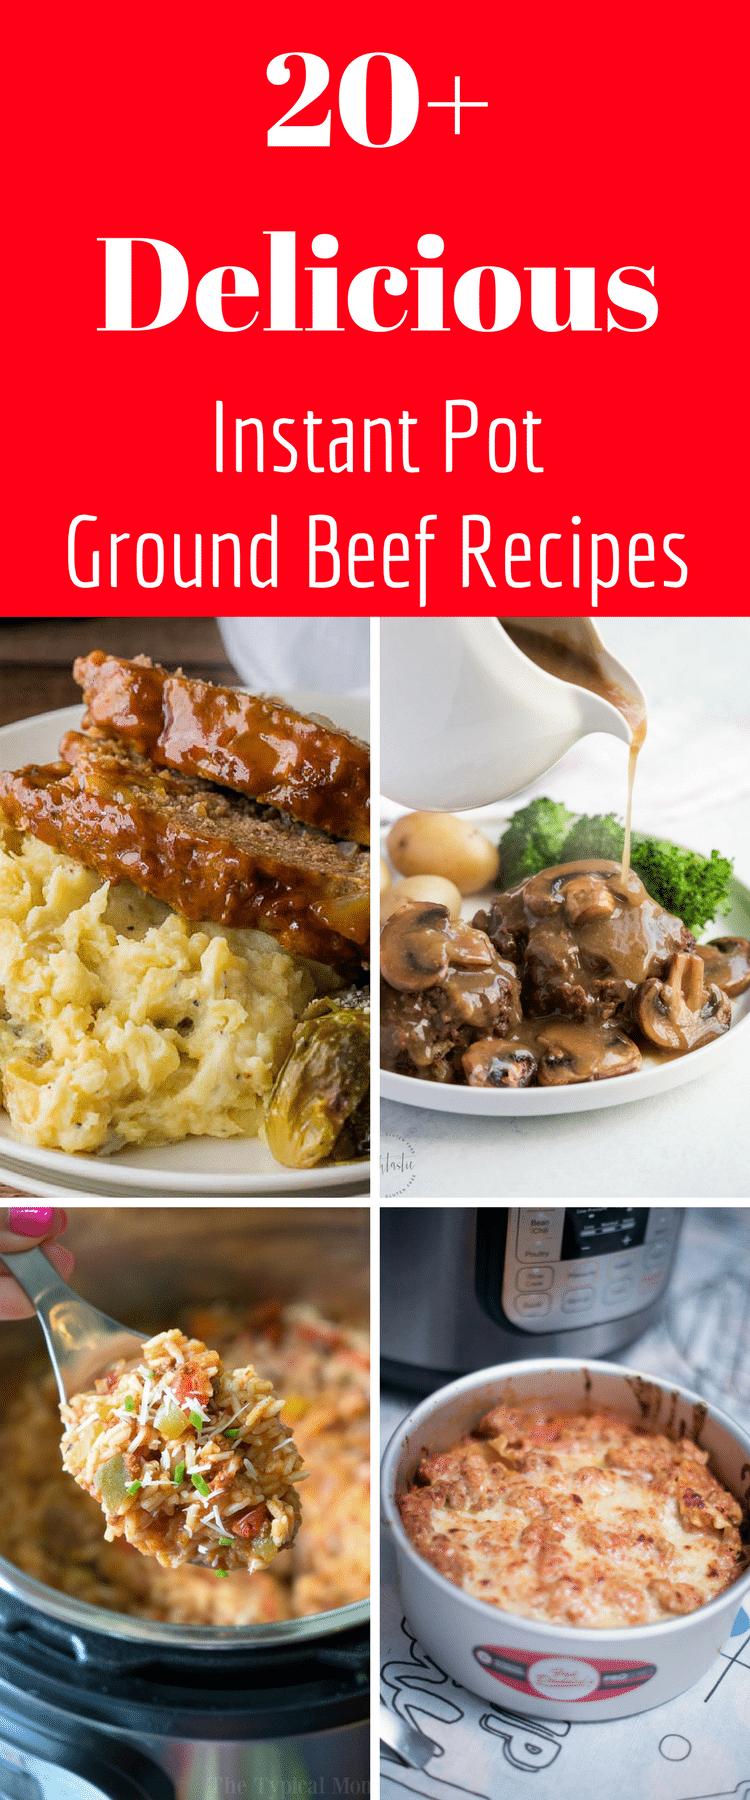 Ground Beef Instant Pot Recipes via @clarkscondensed